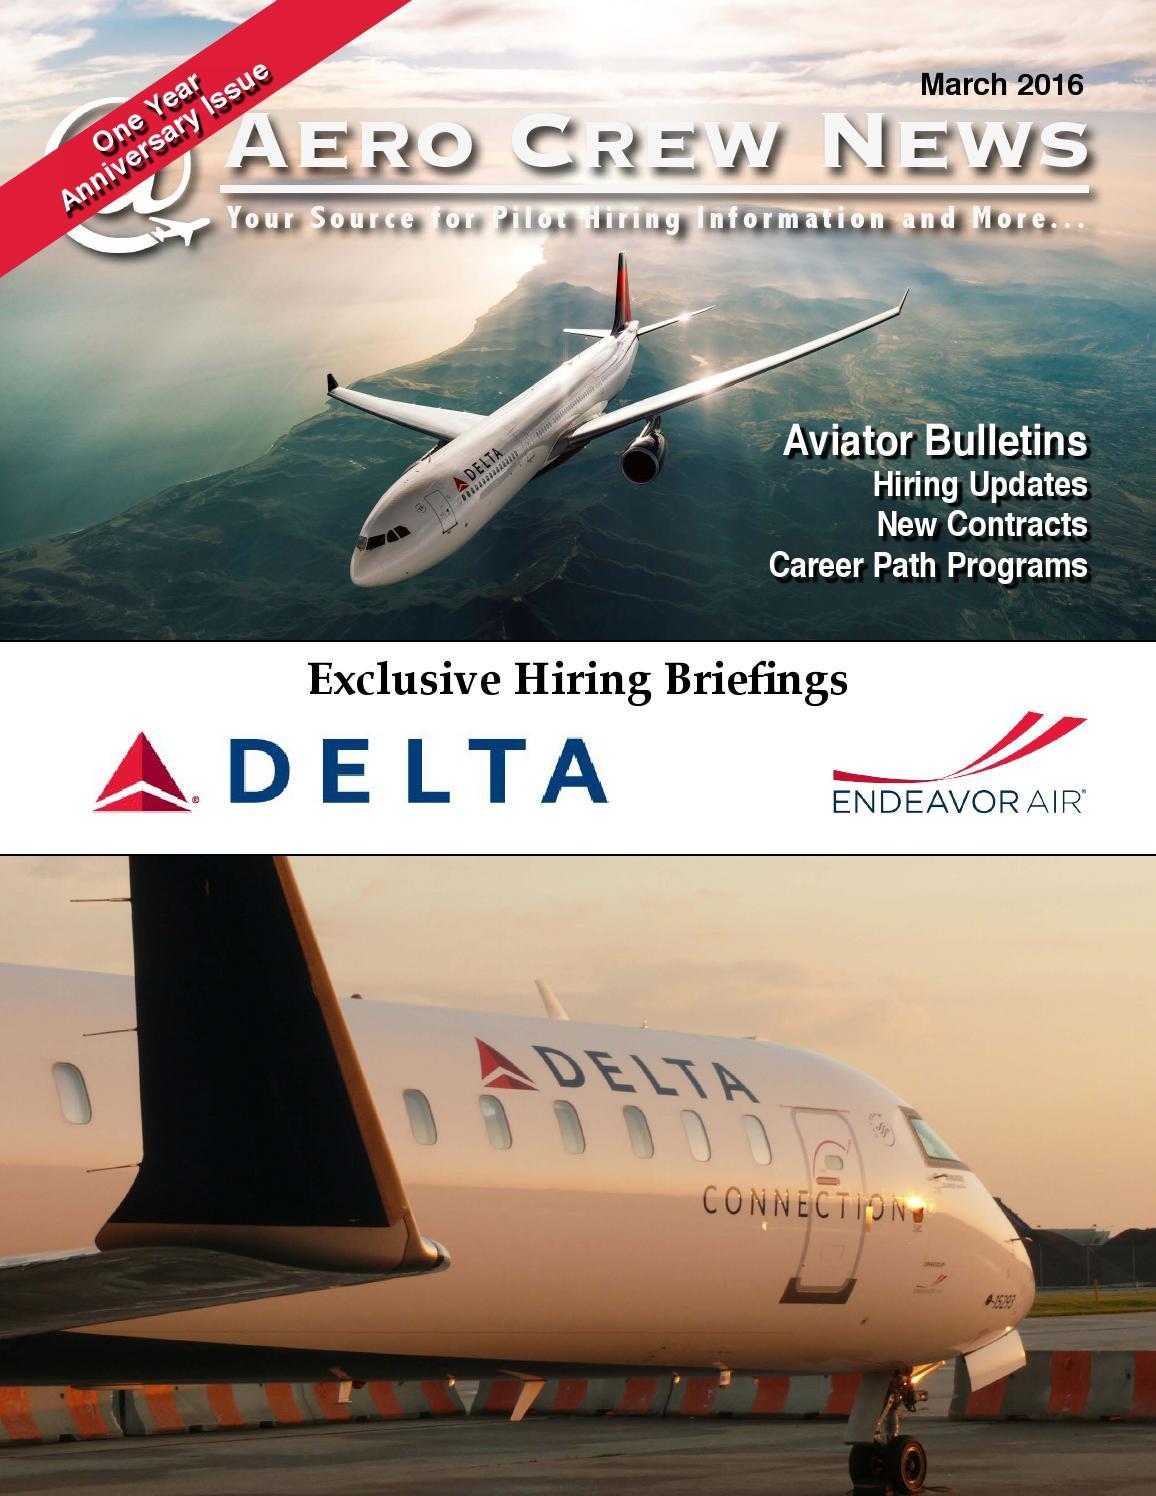 Aero Crew News, March 2016 by Aero Crew News - issuu